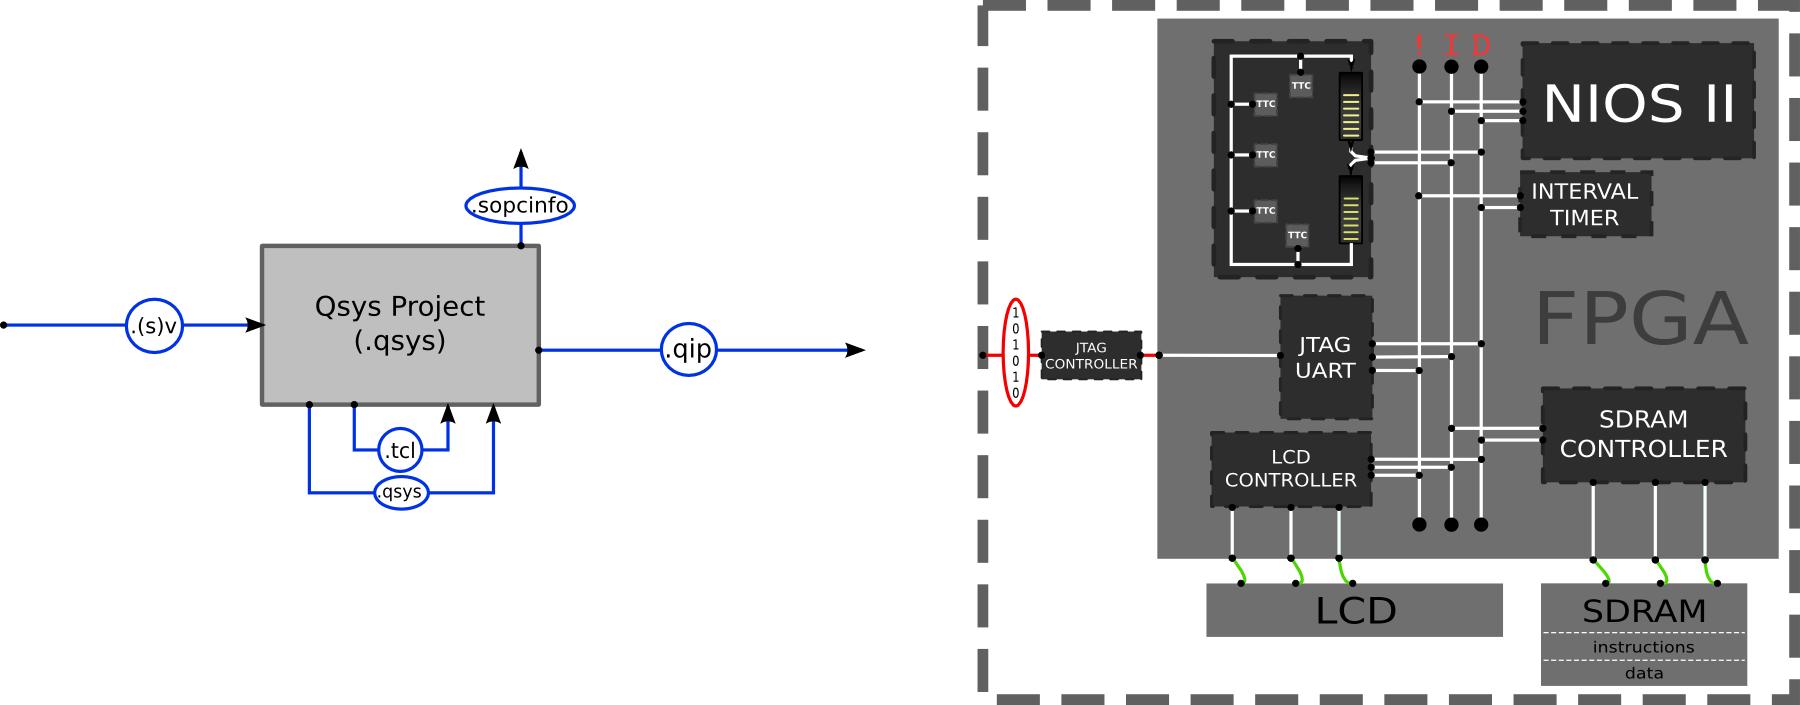 Tt C Block Diagram Explained Wiring Diagrams Ttc M Computer Laboratory Ecad And Architecture Practical Classes